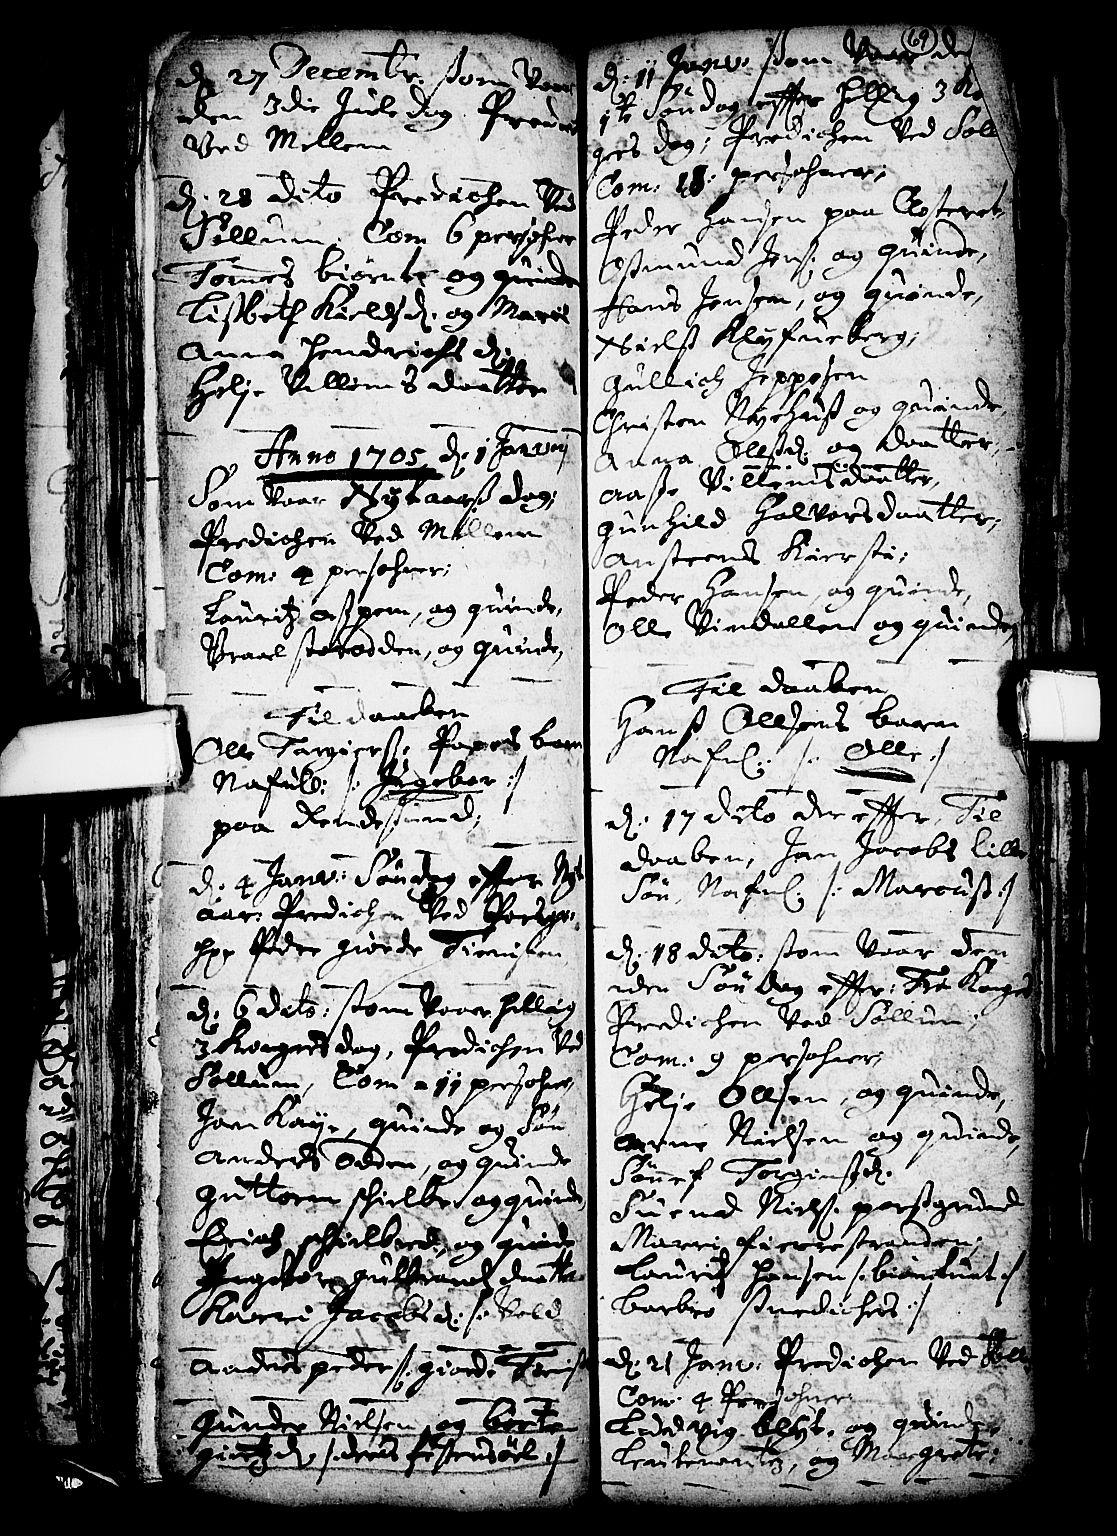 SAKO, Solum kirkebøker, F/Fa/L0001: Ministerialbok nr. I 1, 1701-1716, s. 69